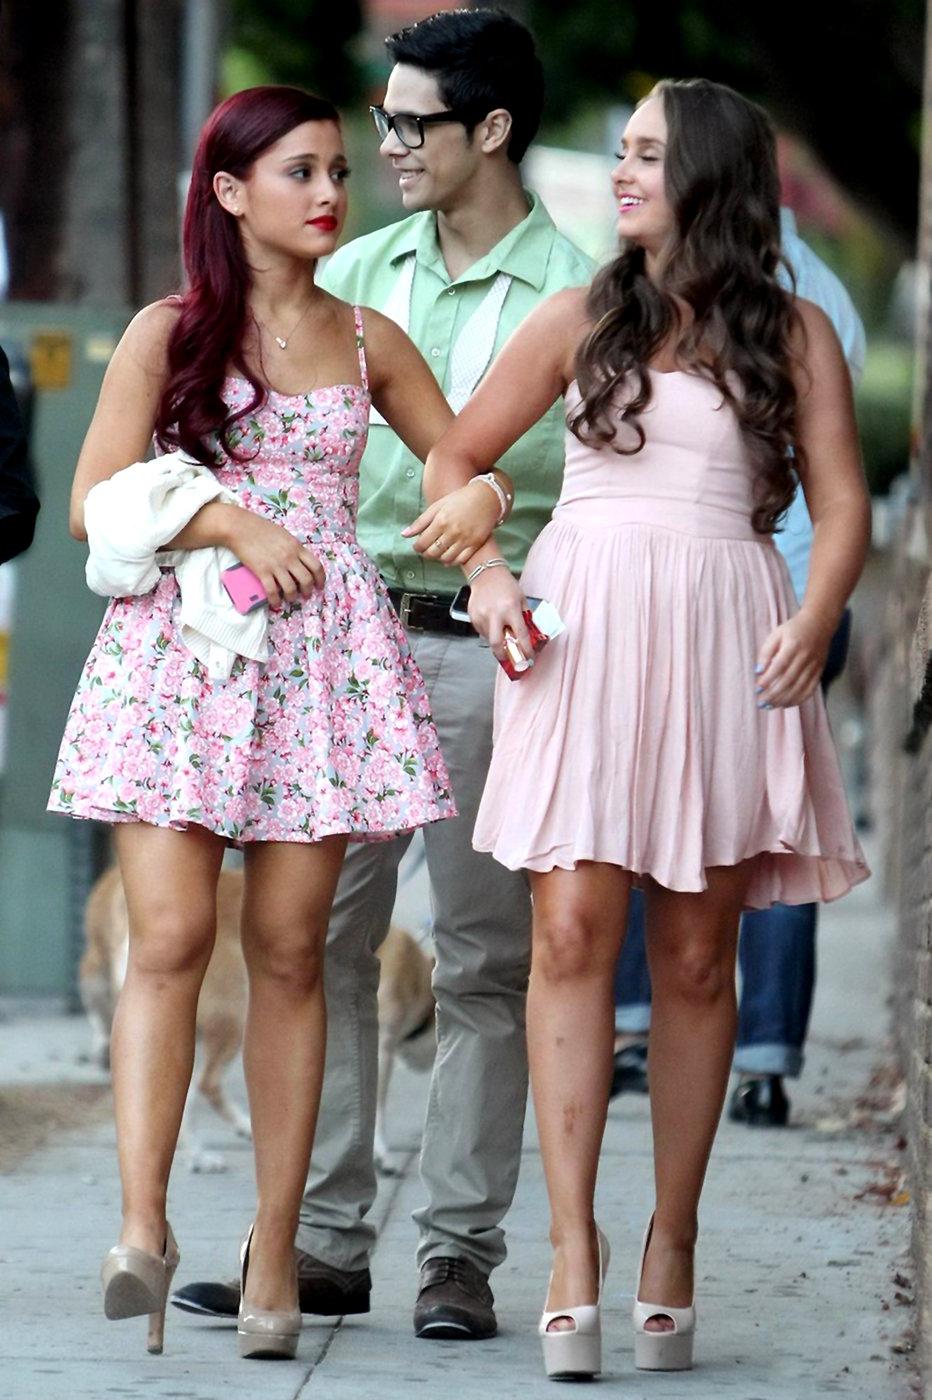 Ariana Grande 19th birthday party Eleven restaurant June 25, 2012